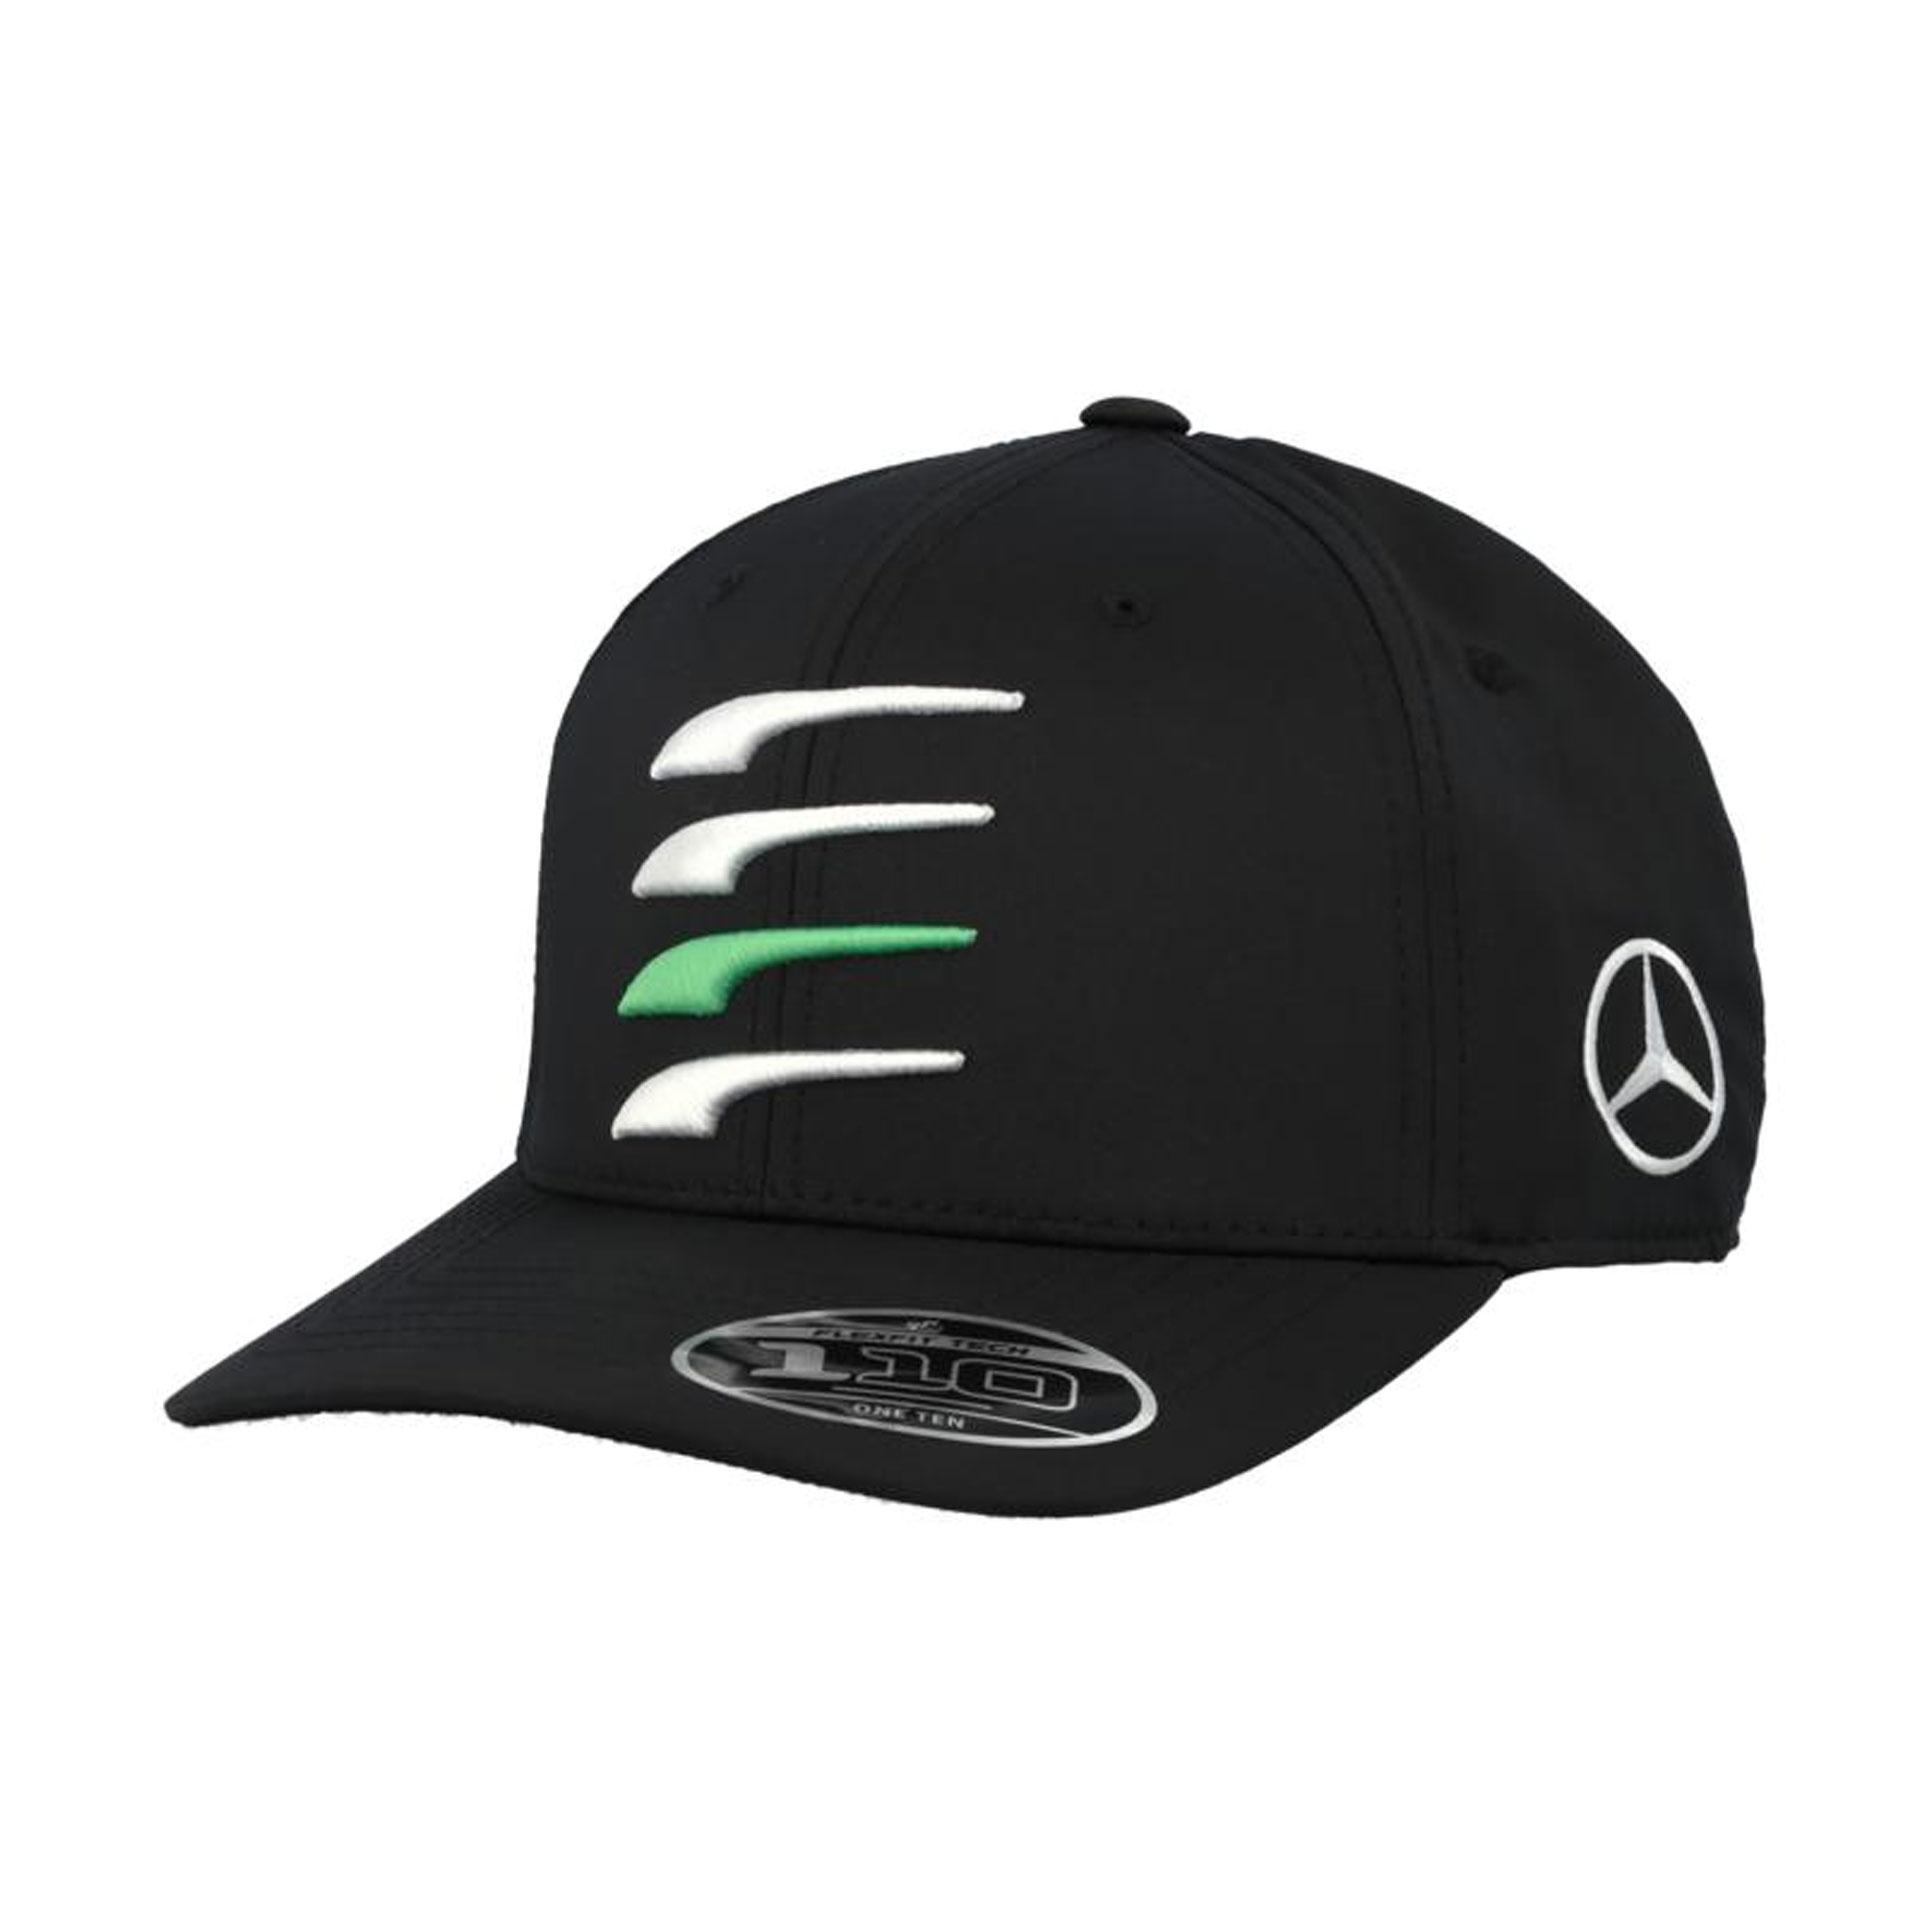 Mercedes-Benz Golf-Cap schwarz Basecap Kappe by PUMA